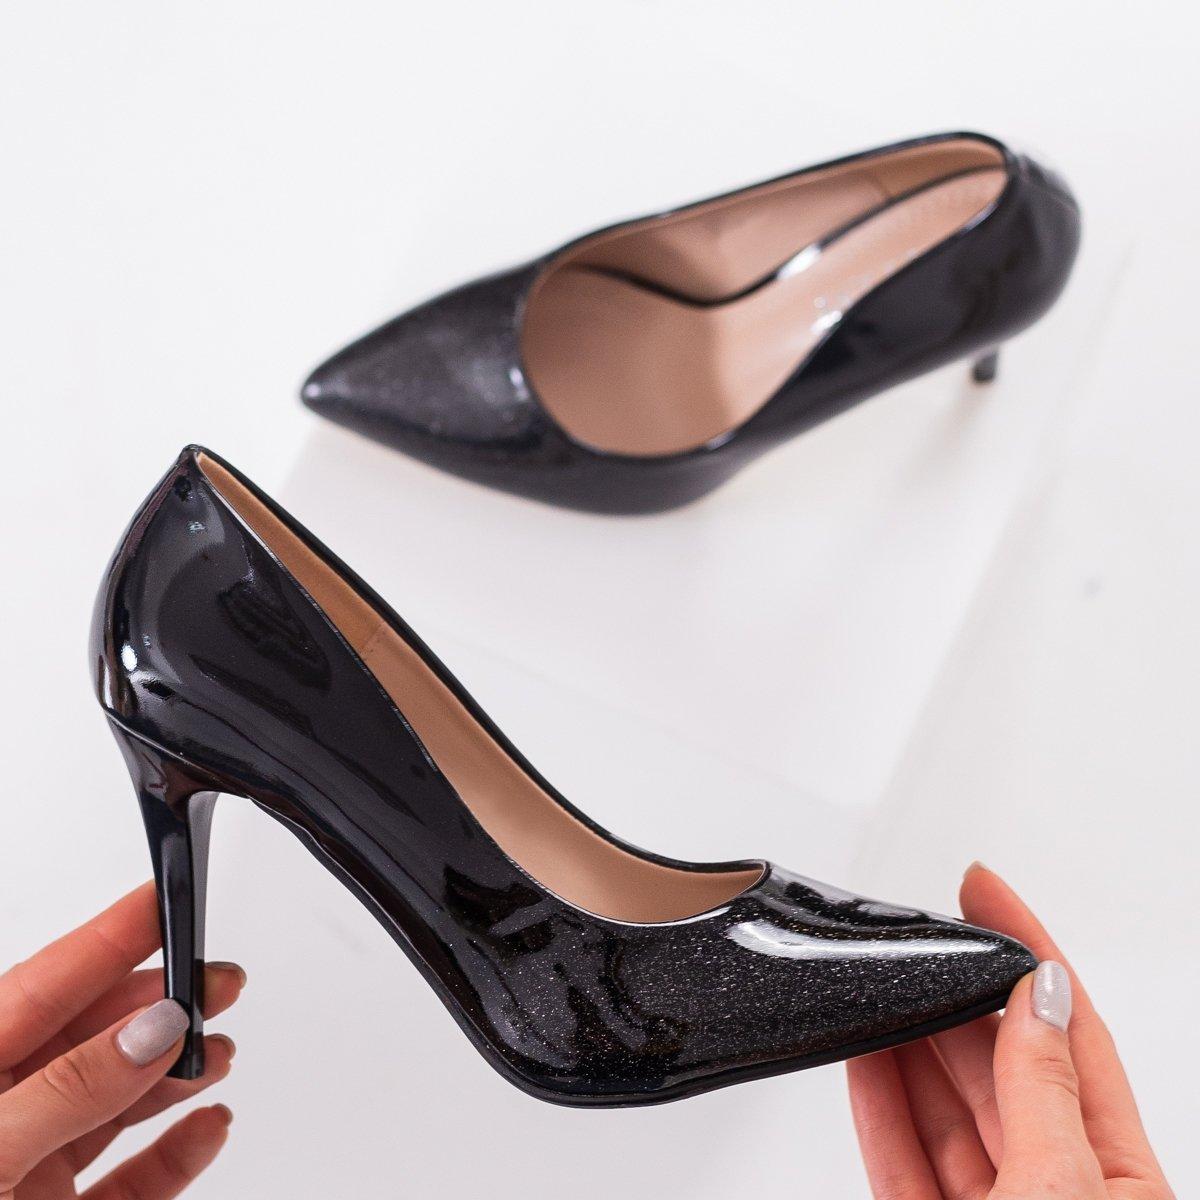 pantofi-cu-toc-dama-negri-cu-sclipici-avenita